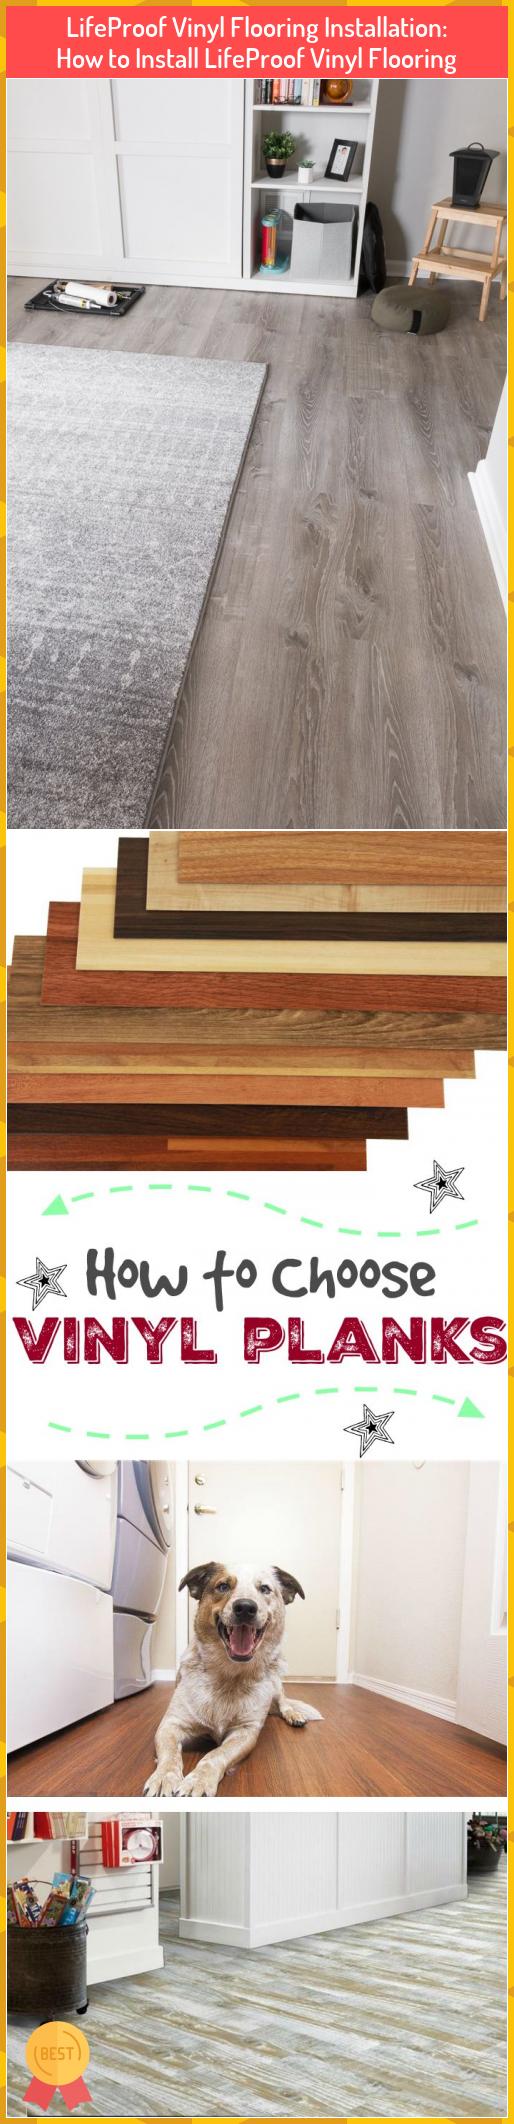 LifeProof Vinyl Flooring Installation How to Install